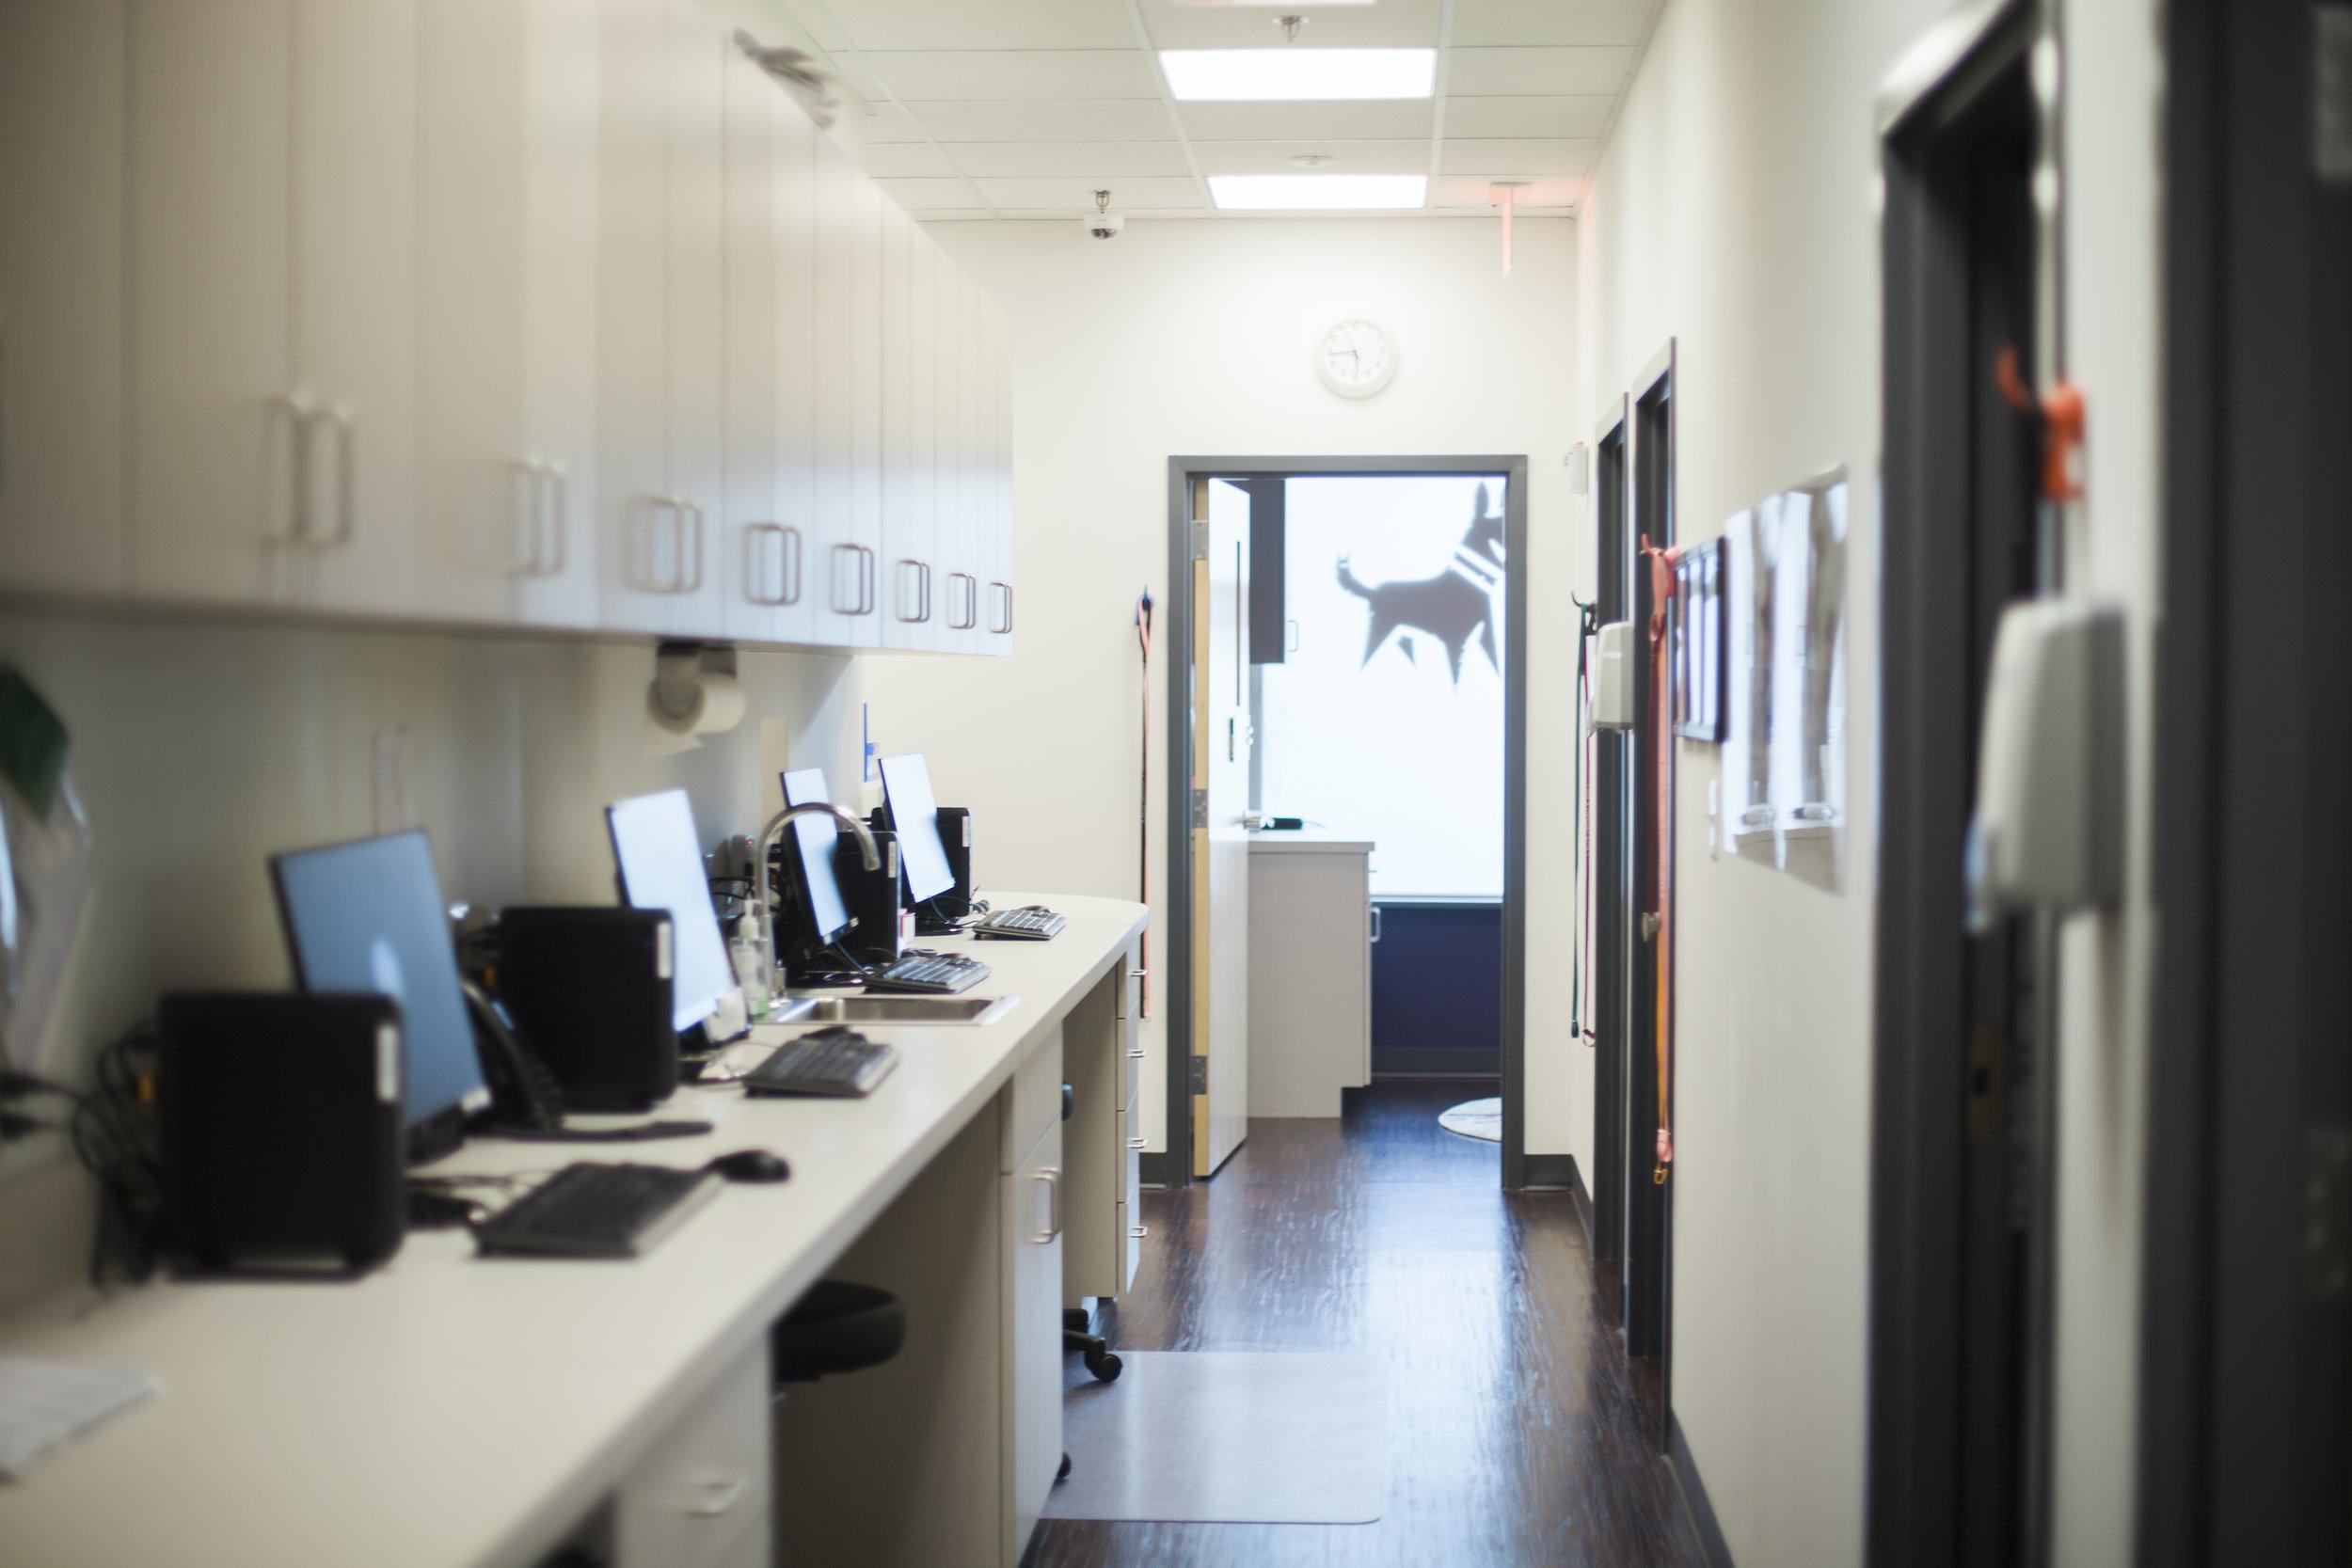 Clarendon Animal Care Veterinary Clinic Arlington Virginia computer stations